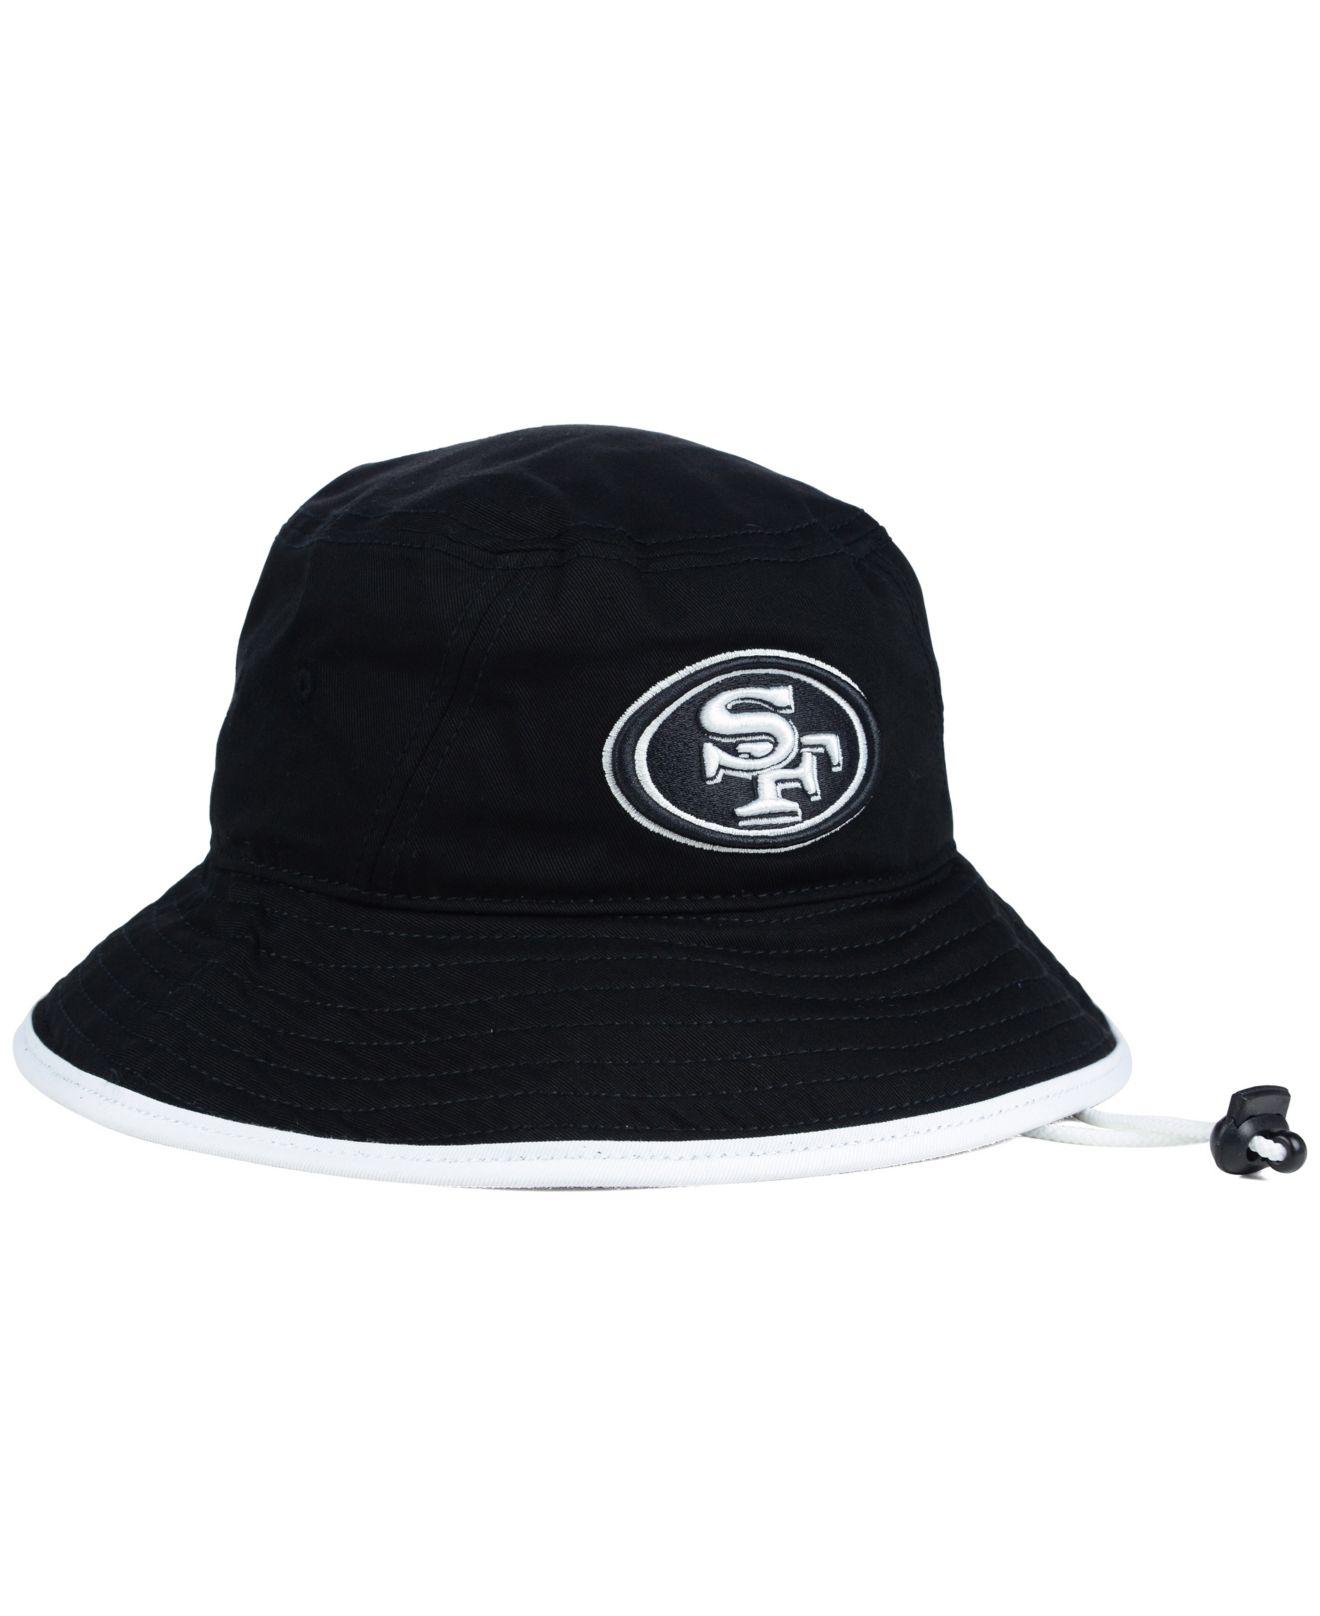 282188c4 official store lyst ktz san francisco 49ers nfl black white bucket hat in  black 7207c d2063